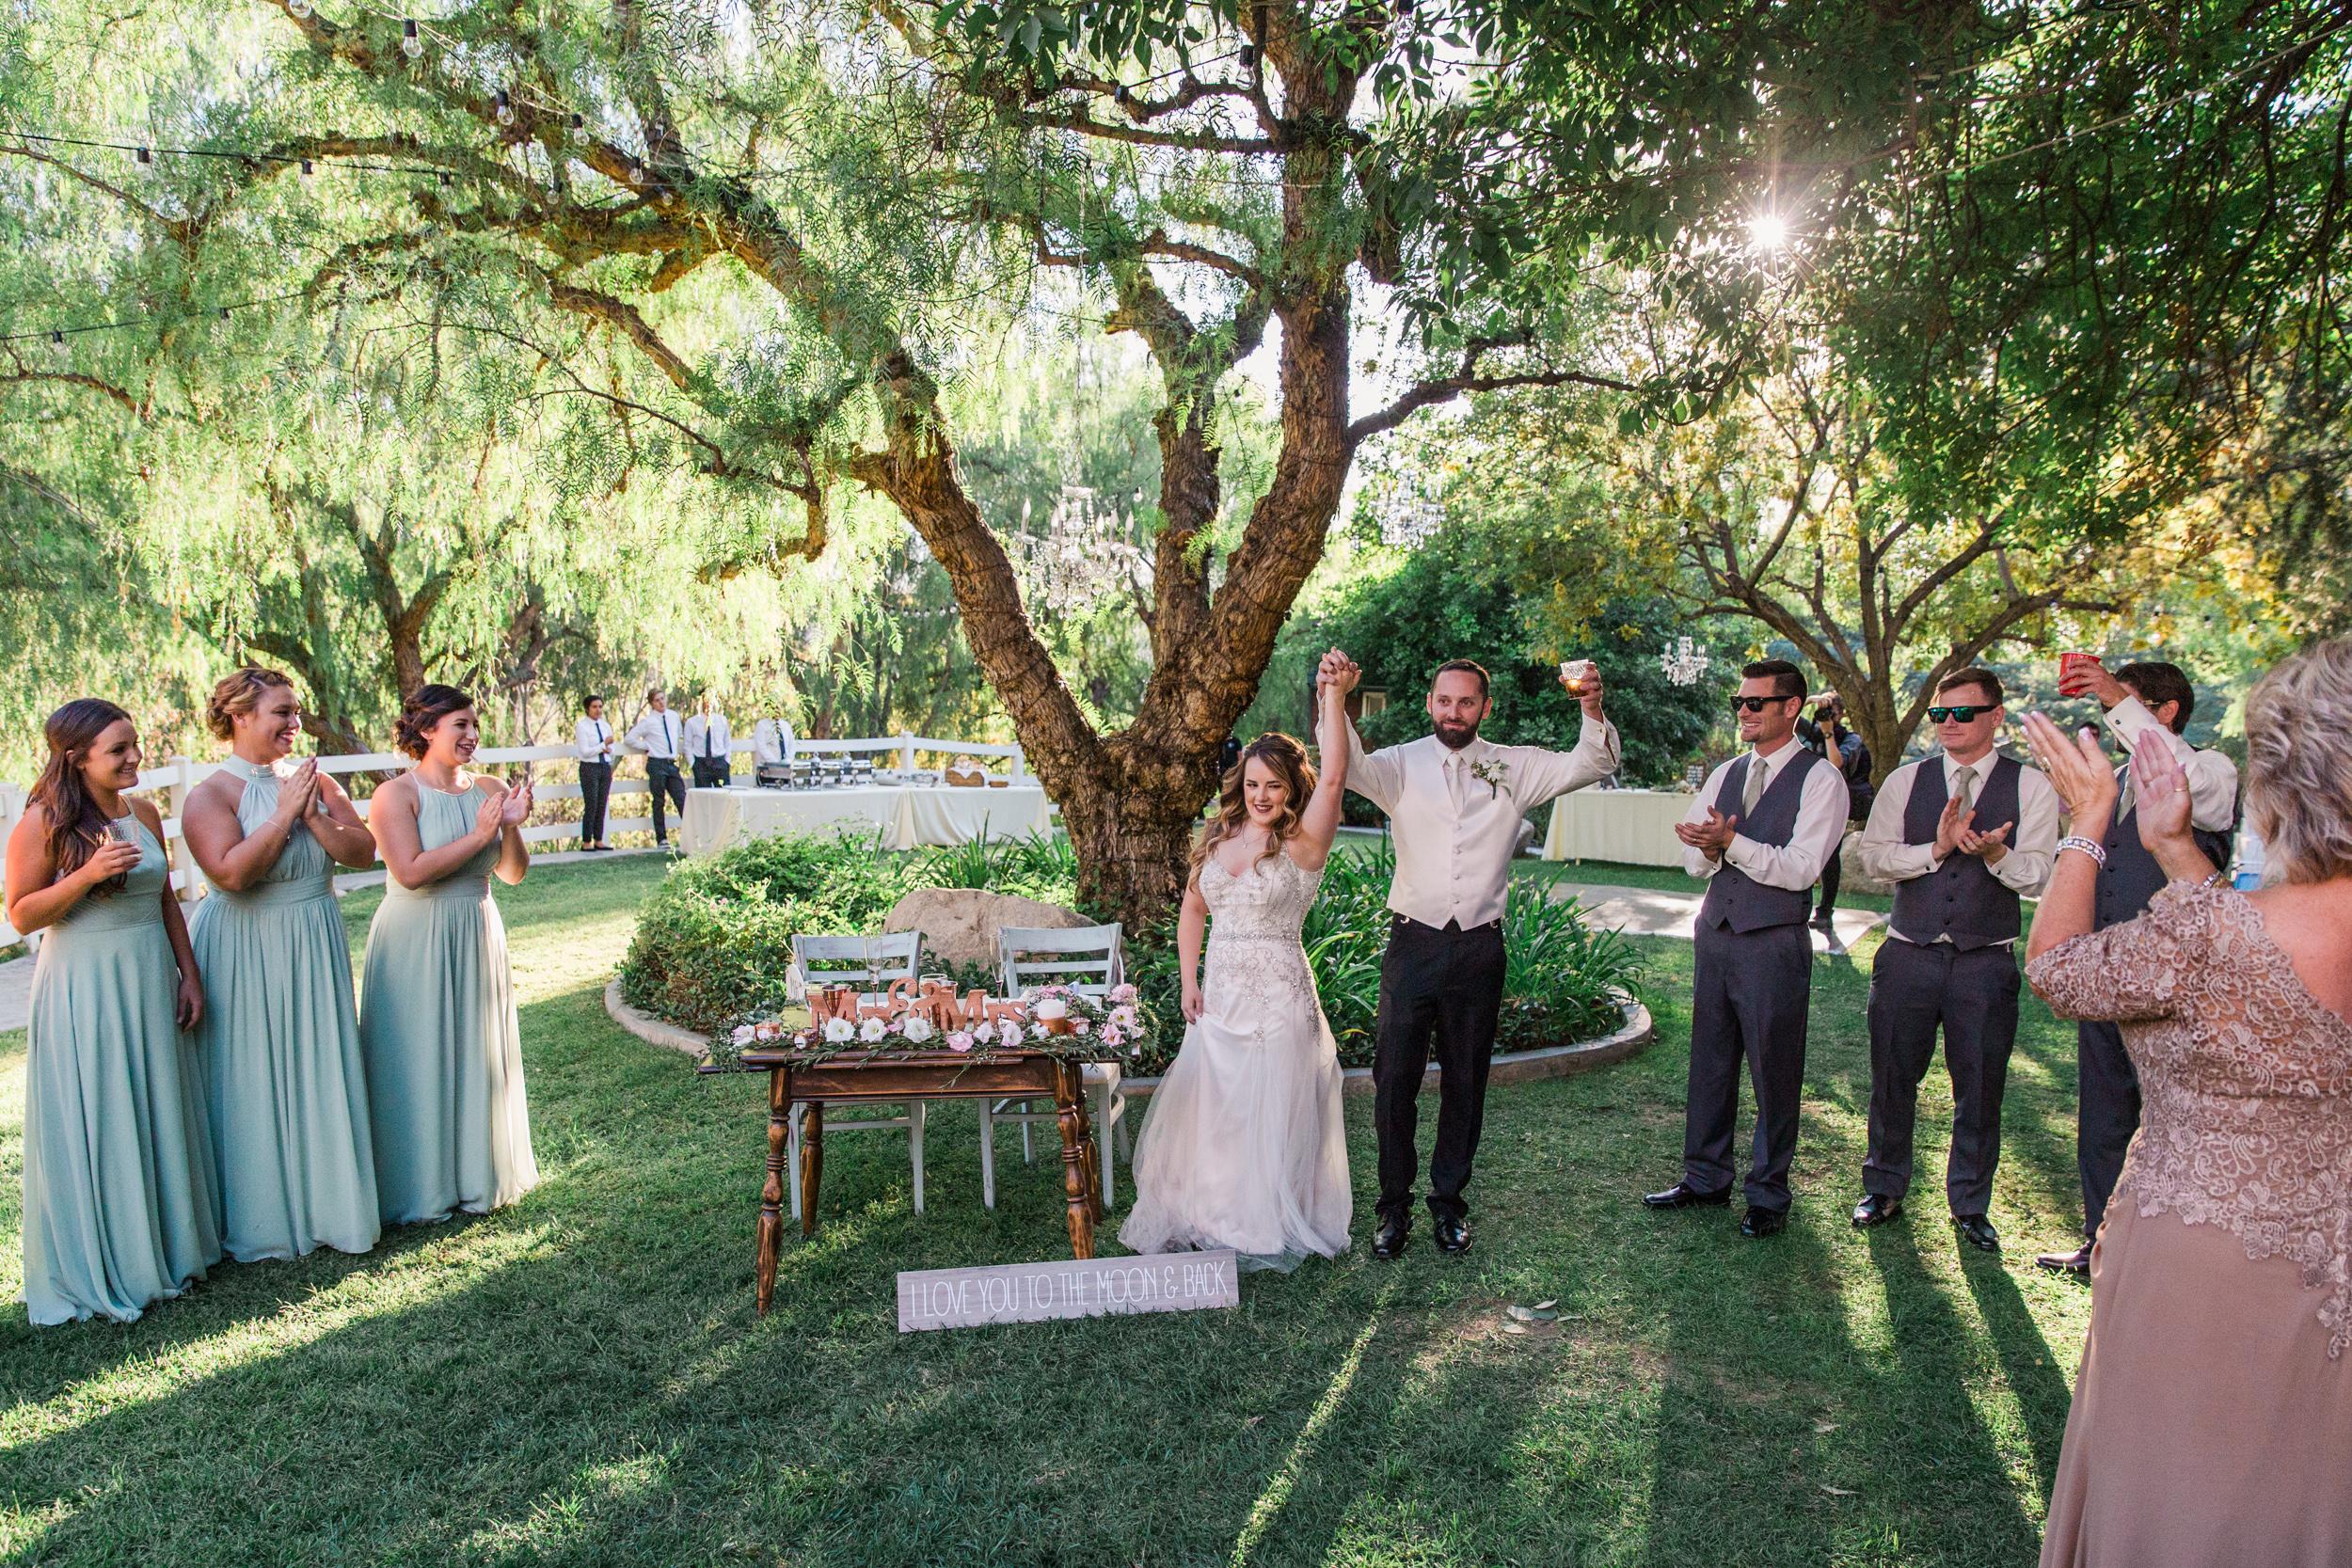 68-0850-jewel-maree-photography-wedding.jpg